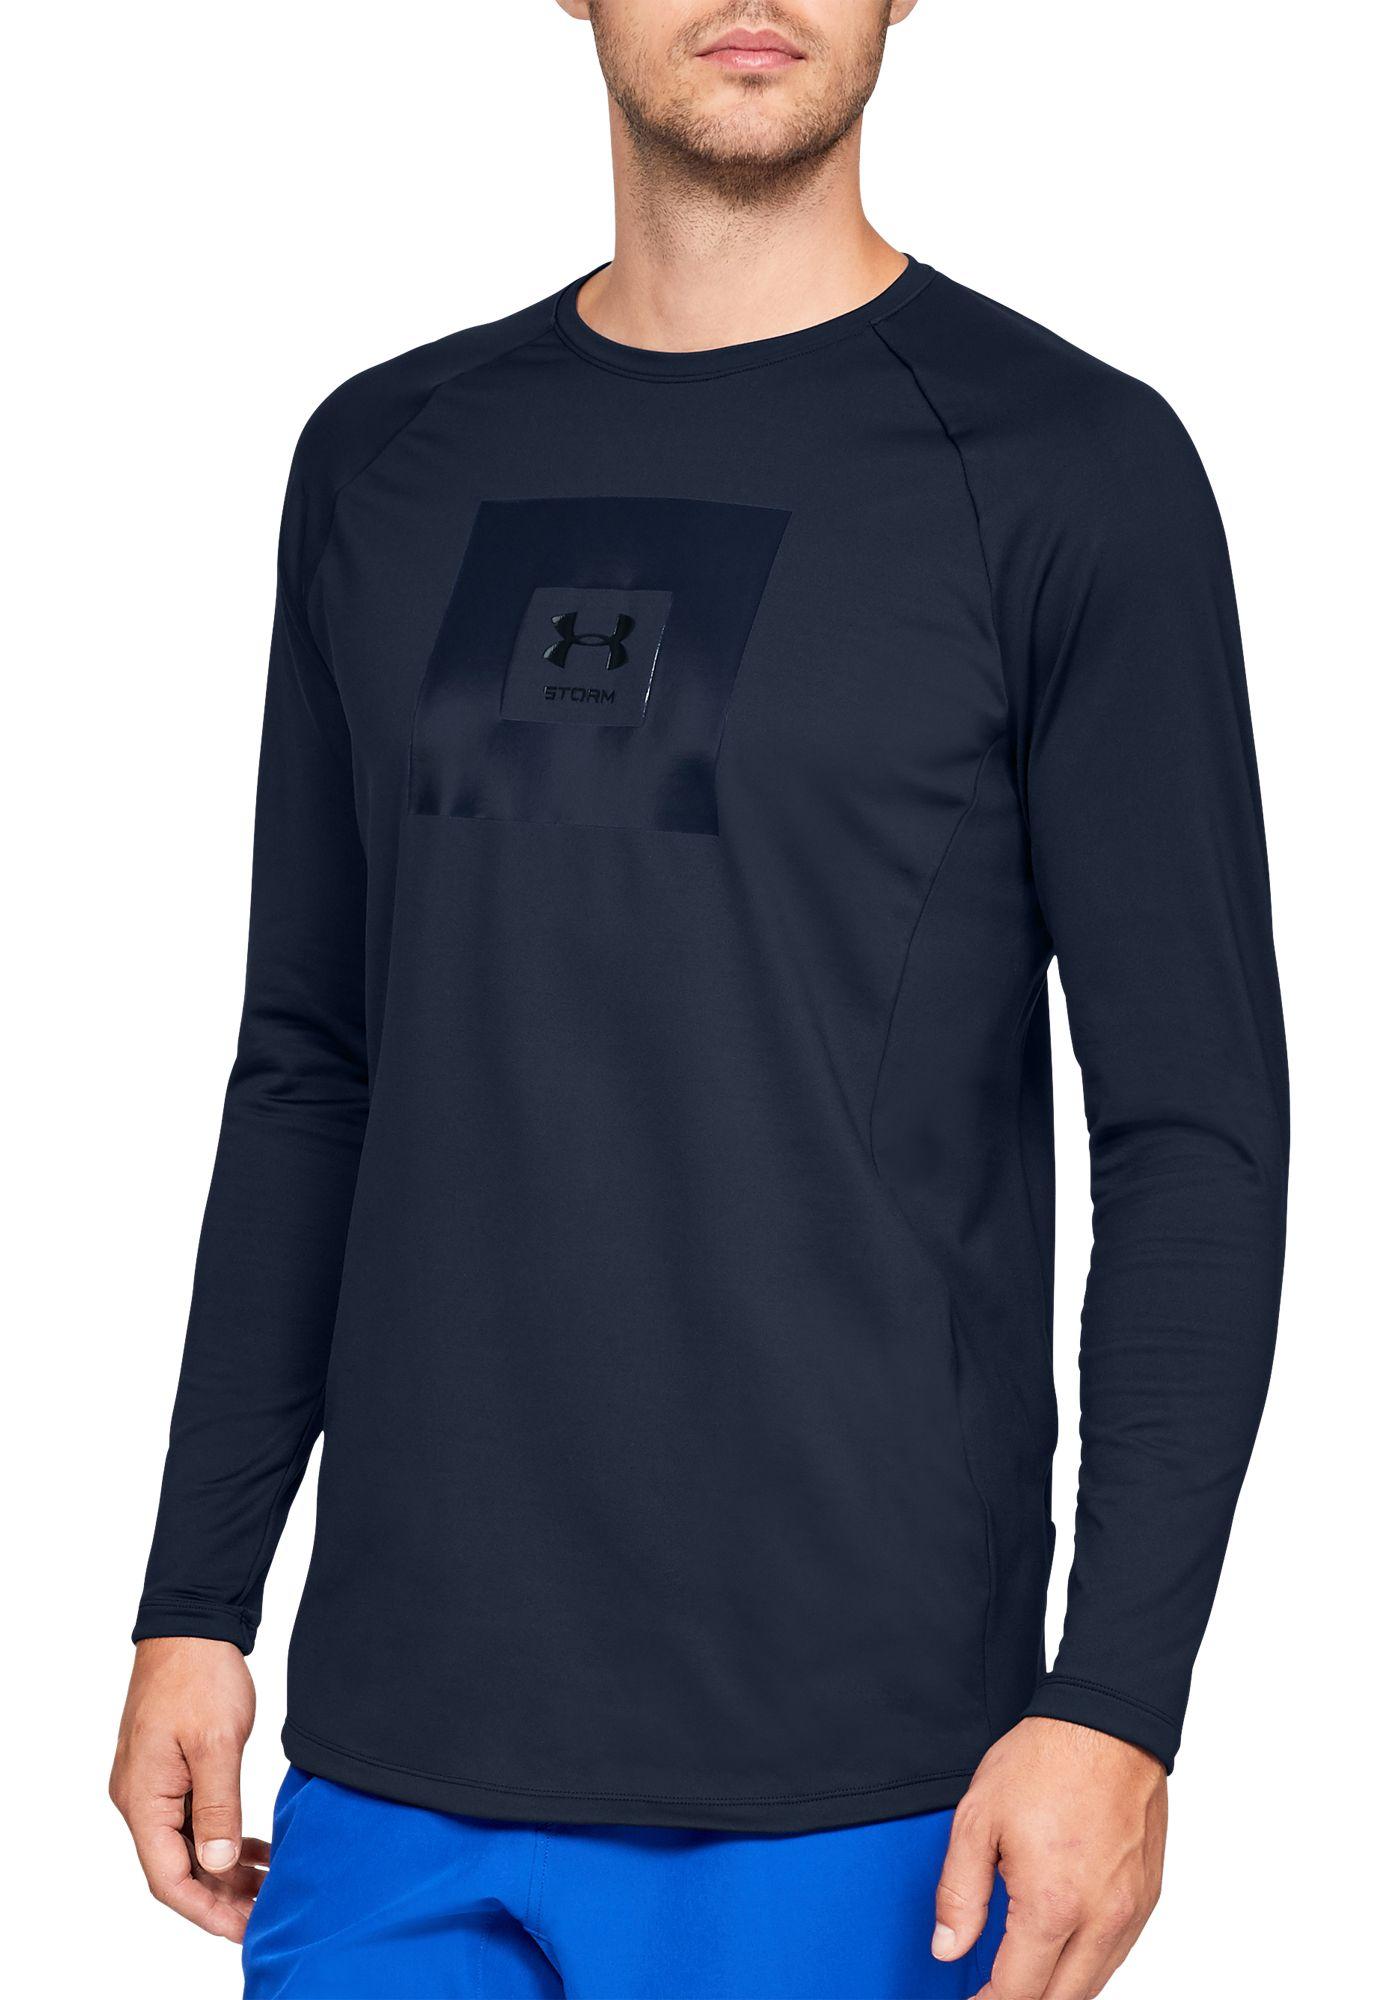 Under Armour Men's Storm Cycle ColdGear Crewneck Long Sleeve Shirt